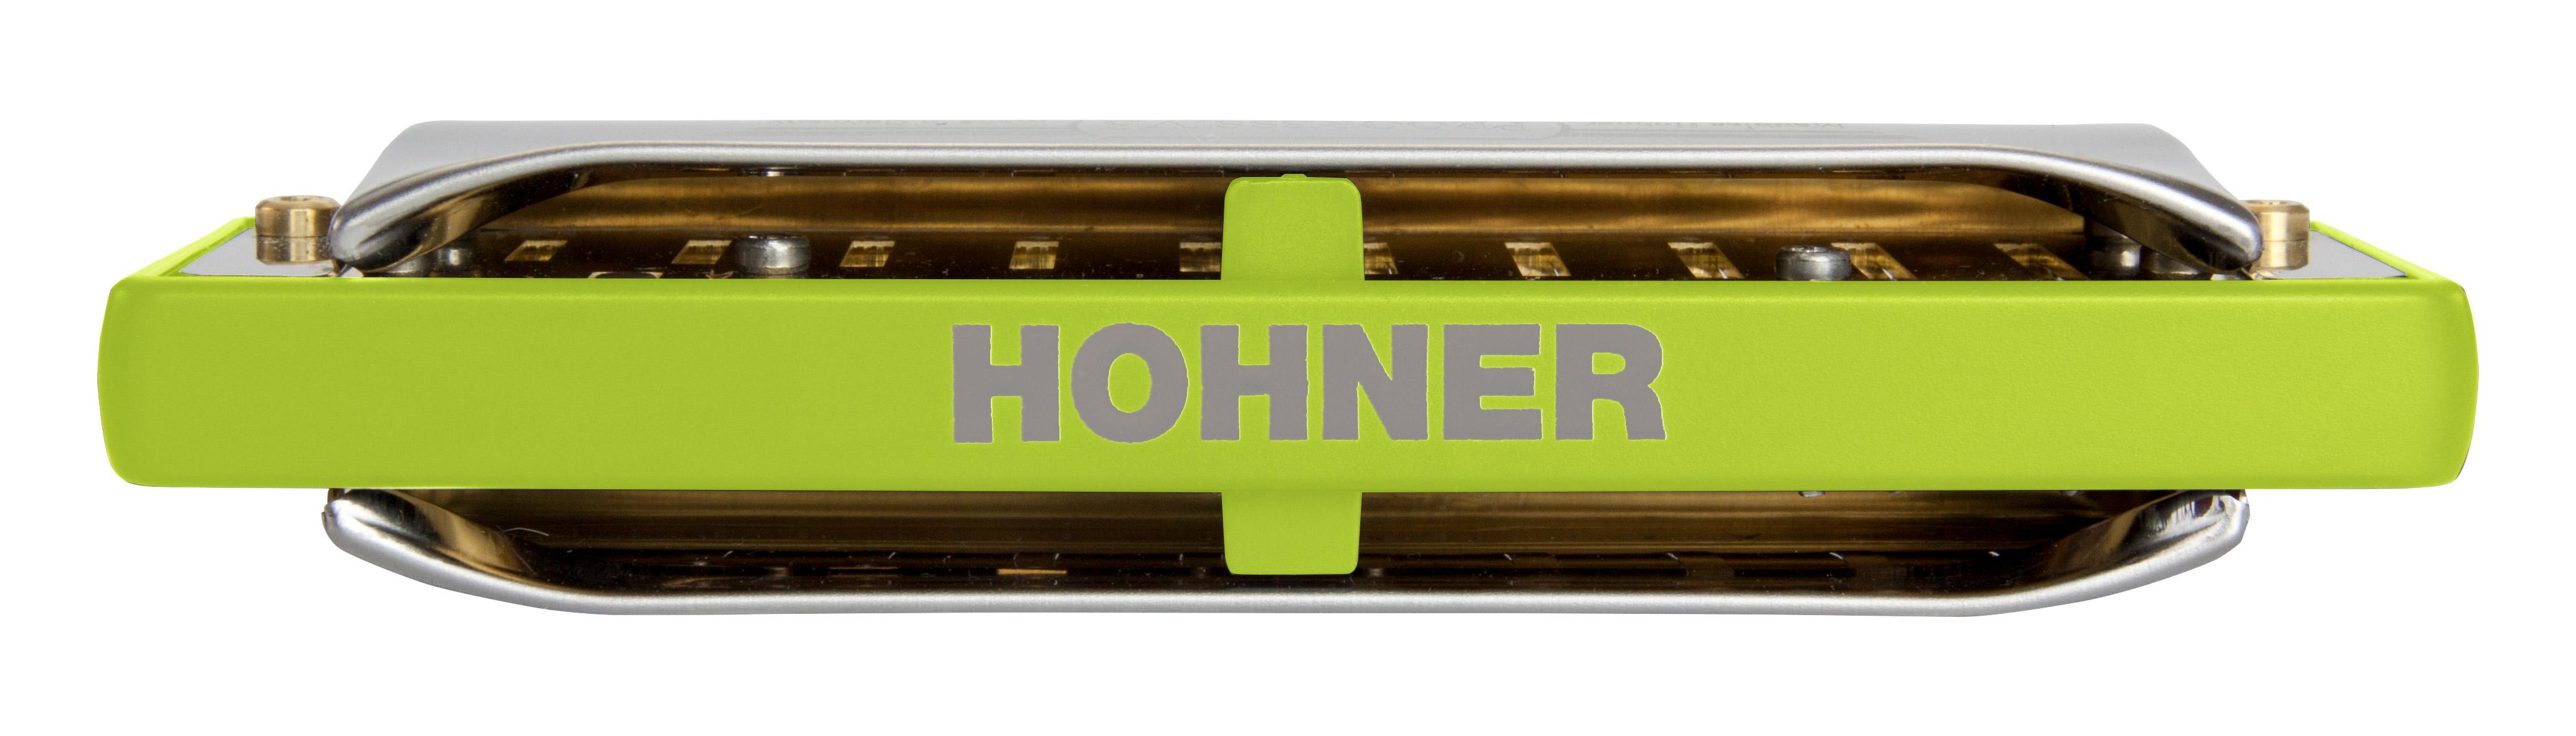 Hohner Rocket Amp E-major